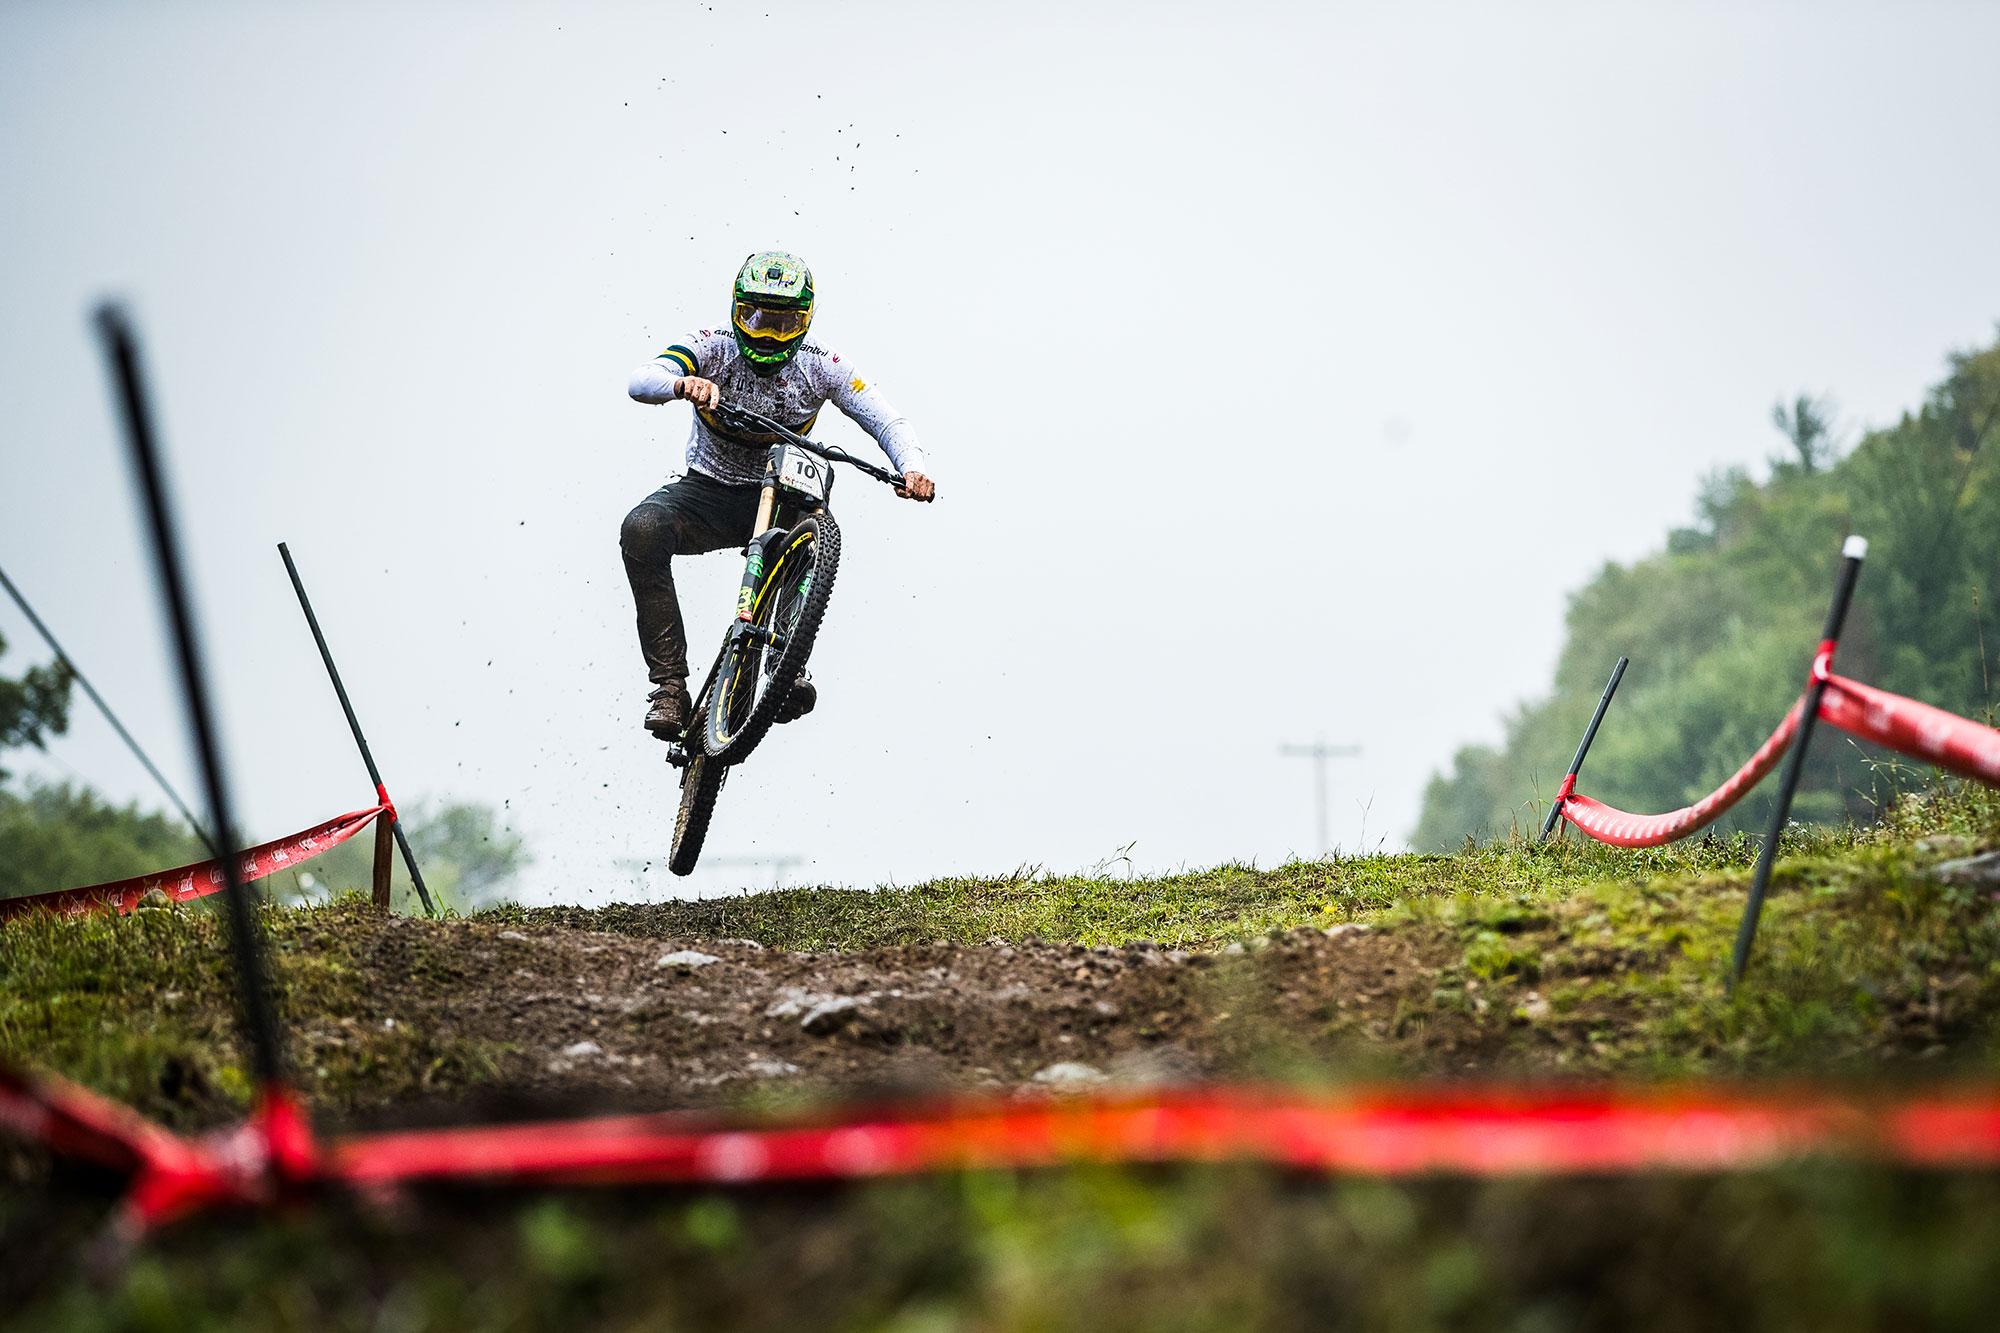 Dean Lucas MSA DH World Champs with Bluegrass Legit Carbon DH Helmet